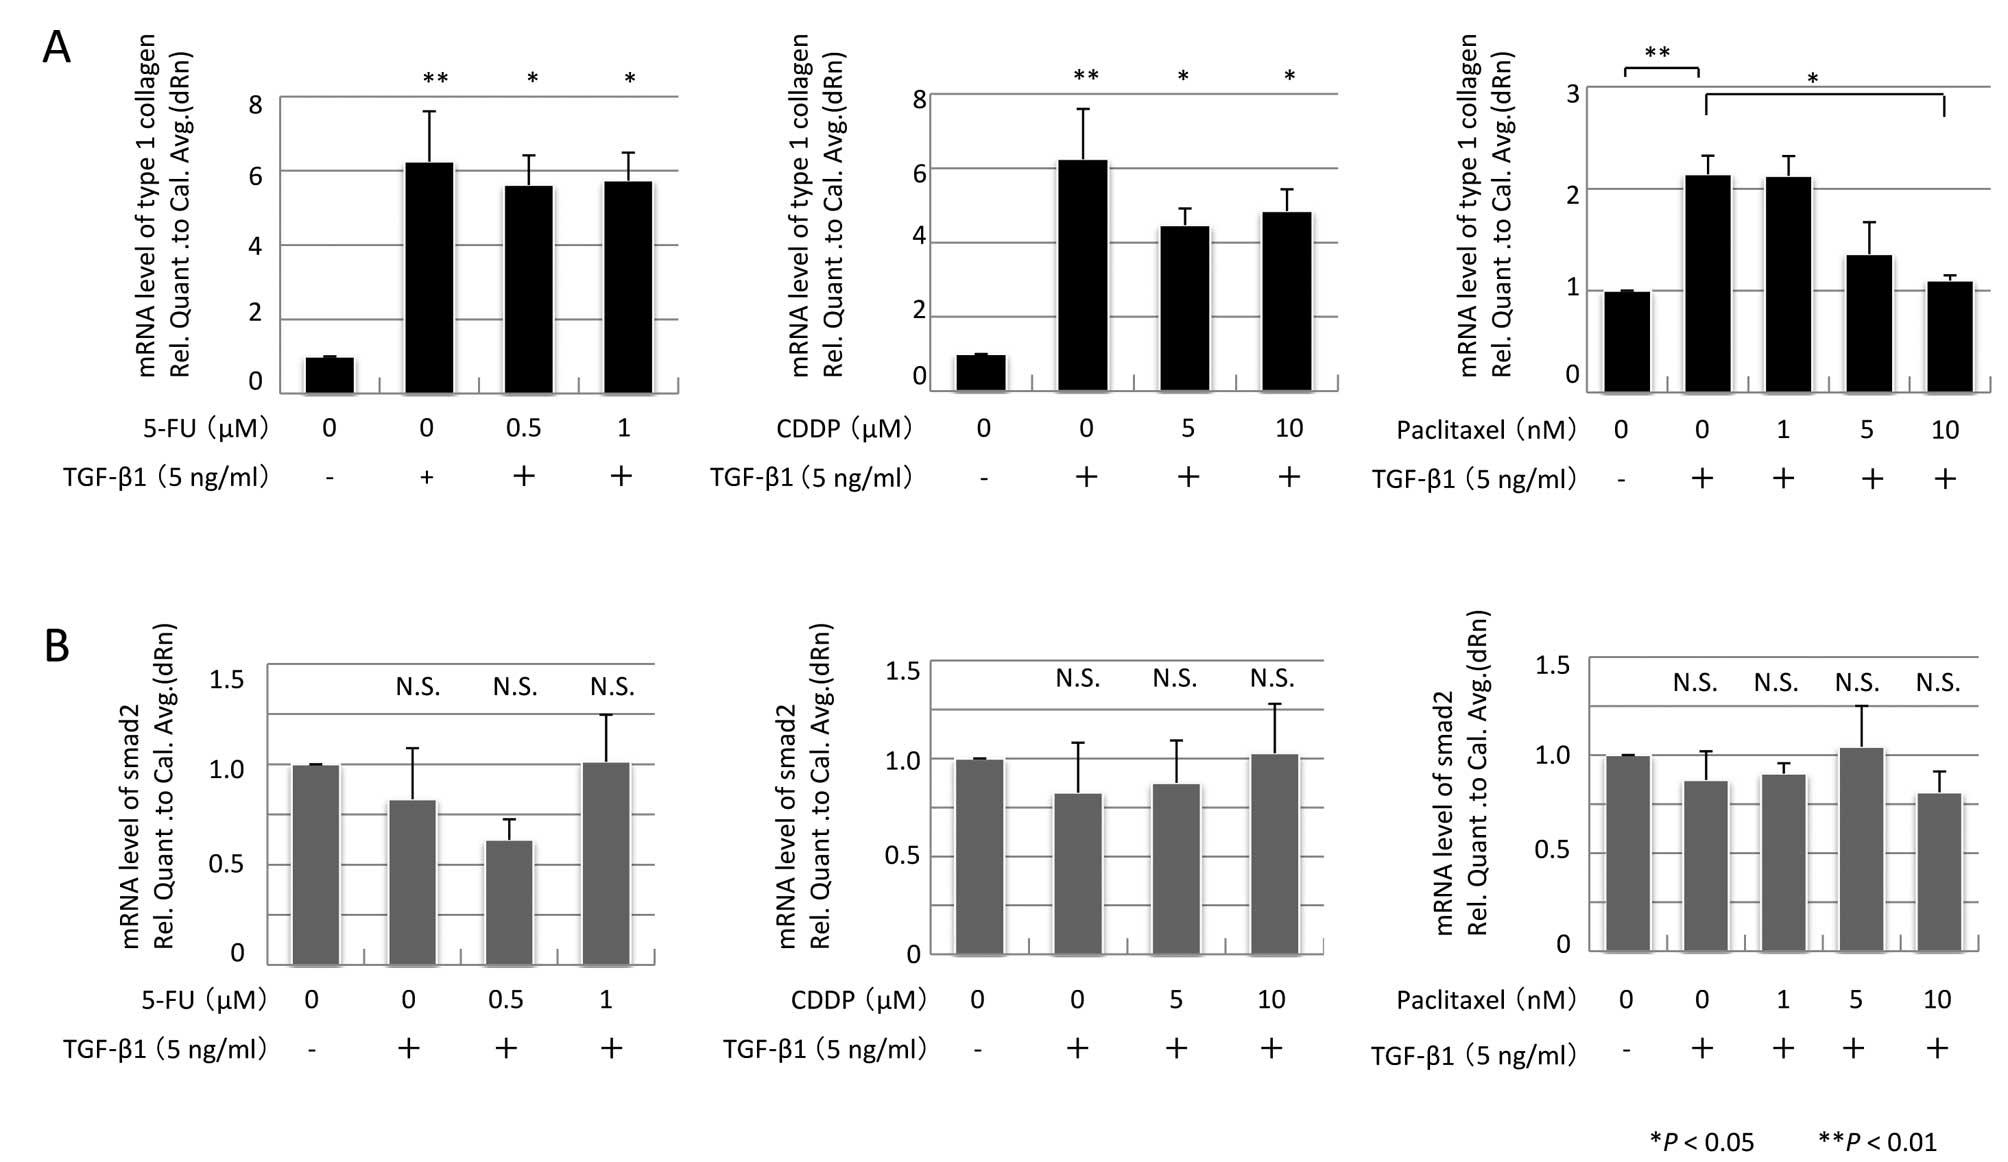 InternationalJournal ofOncologyLow-dose paclitaxel modulates tumour fibrosis in gastric cancer